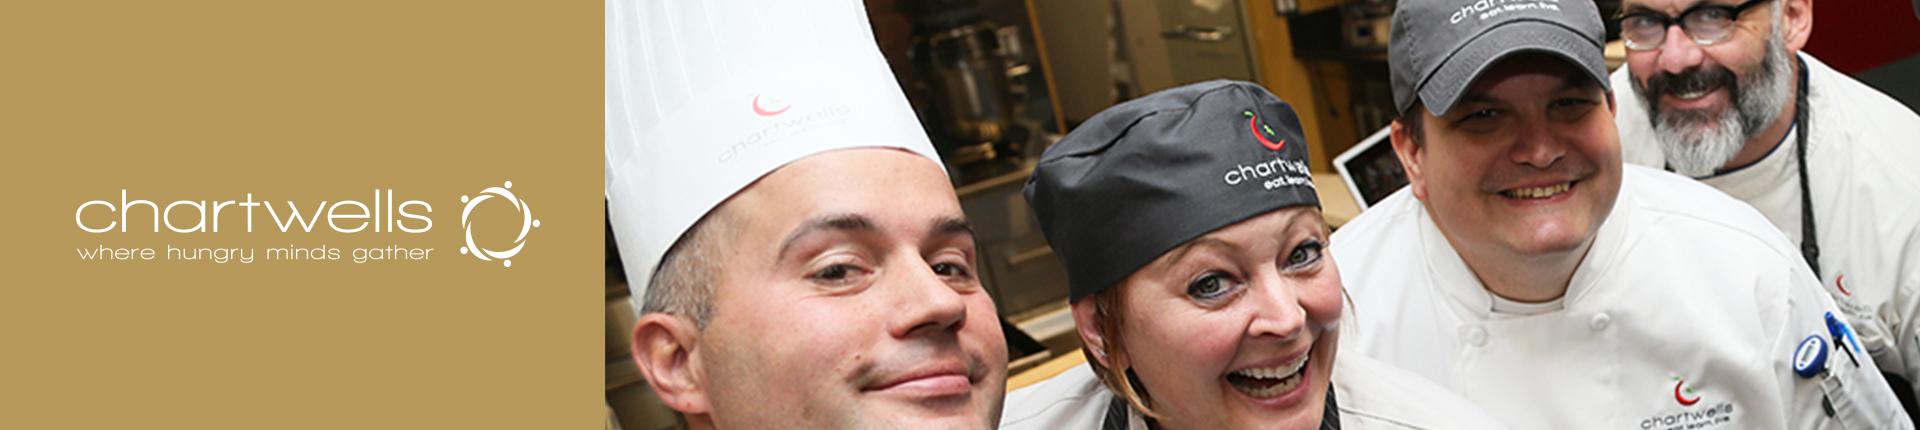 Chefs at Chartwells